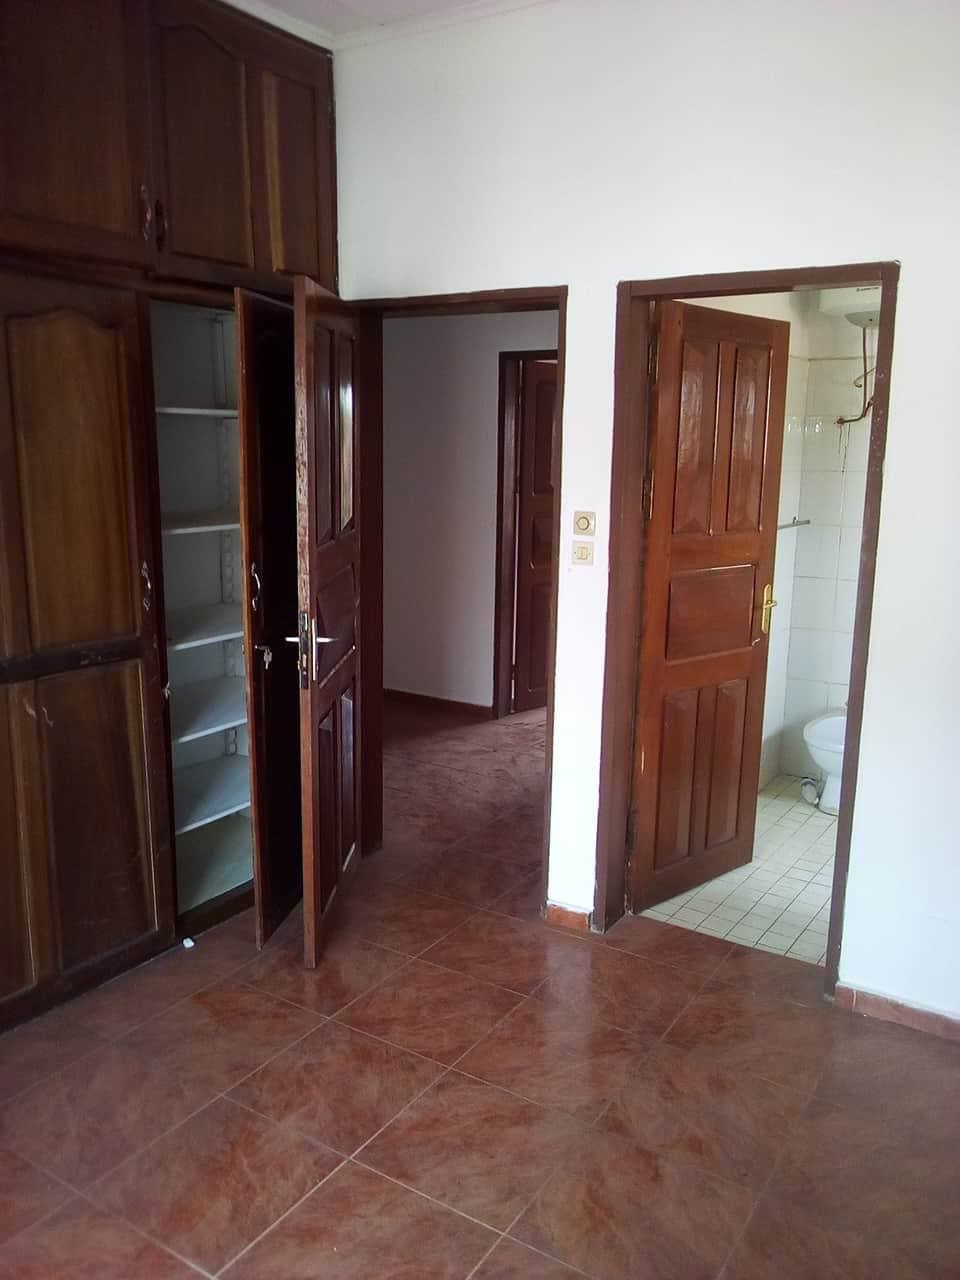 House (Villa) to rent - Yaoundé, Bastos, ambassade de chine - 1 living room(s), 5 bedroom(s), 4 bathroom(s) - 1 800 000 FCFA / month